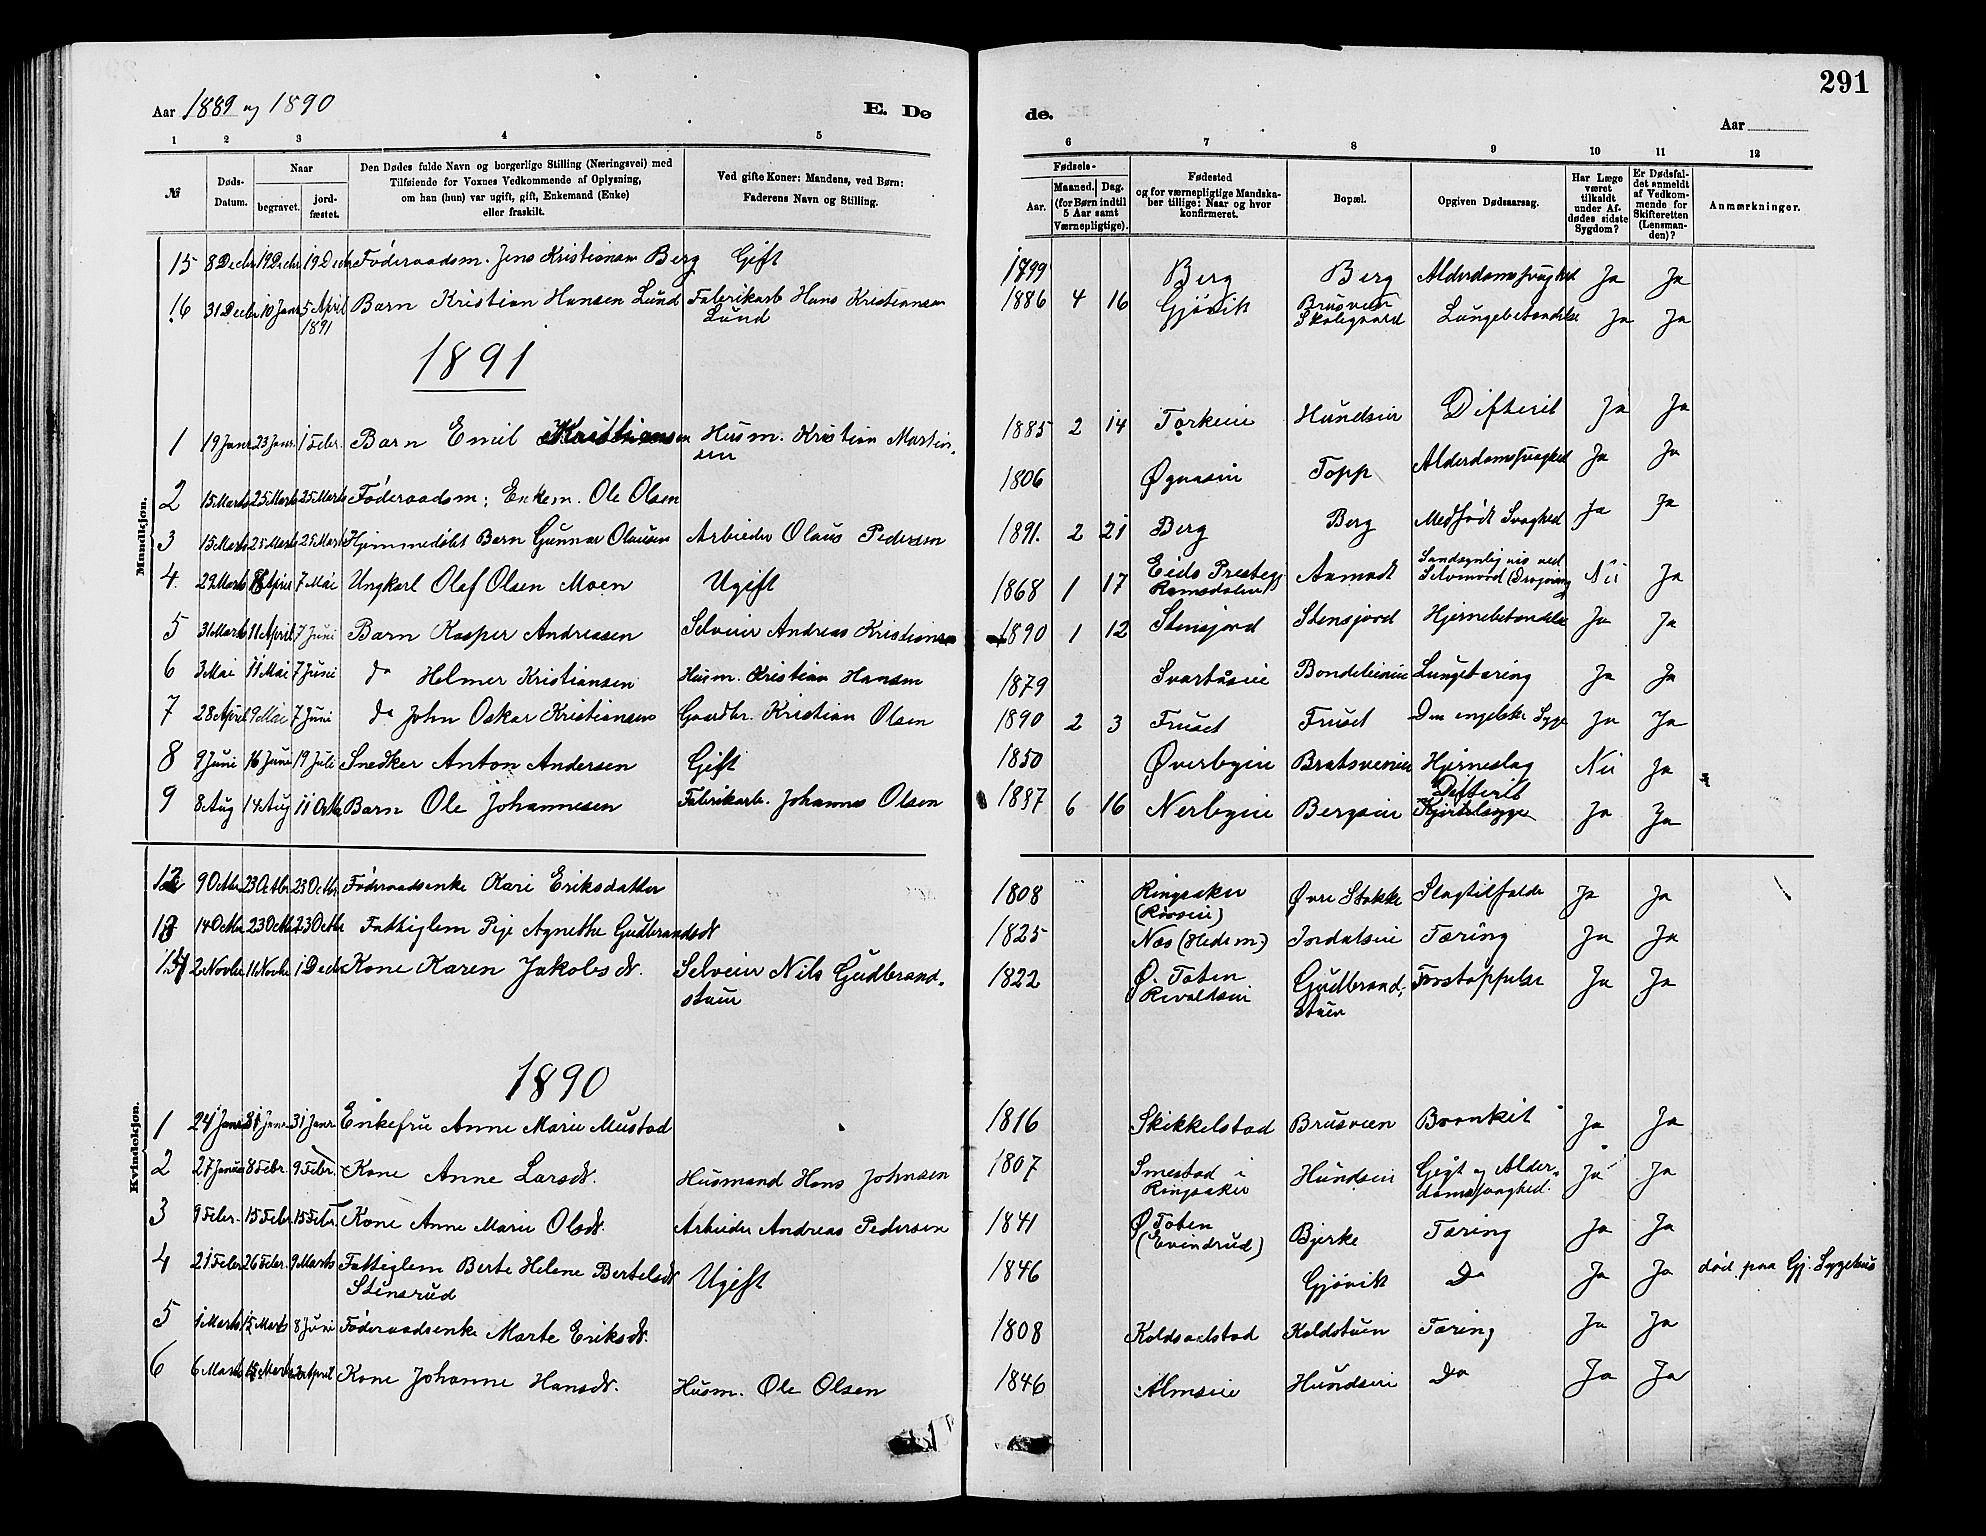 SAH, Vardal prestekontor, H/Ha/Hab/L0007: Klokkerbok nr. 7 /1, 1881-1895, s. 291